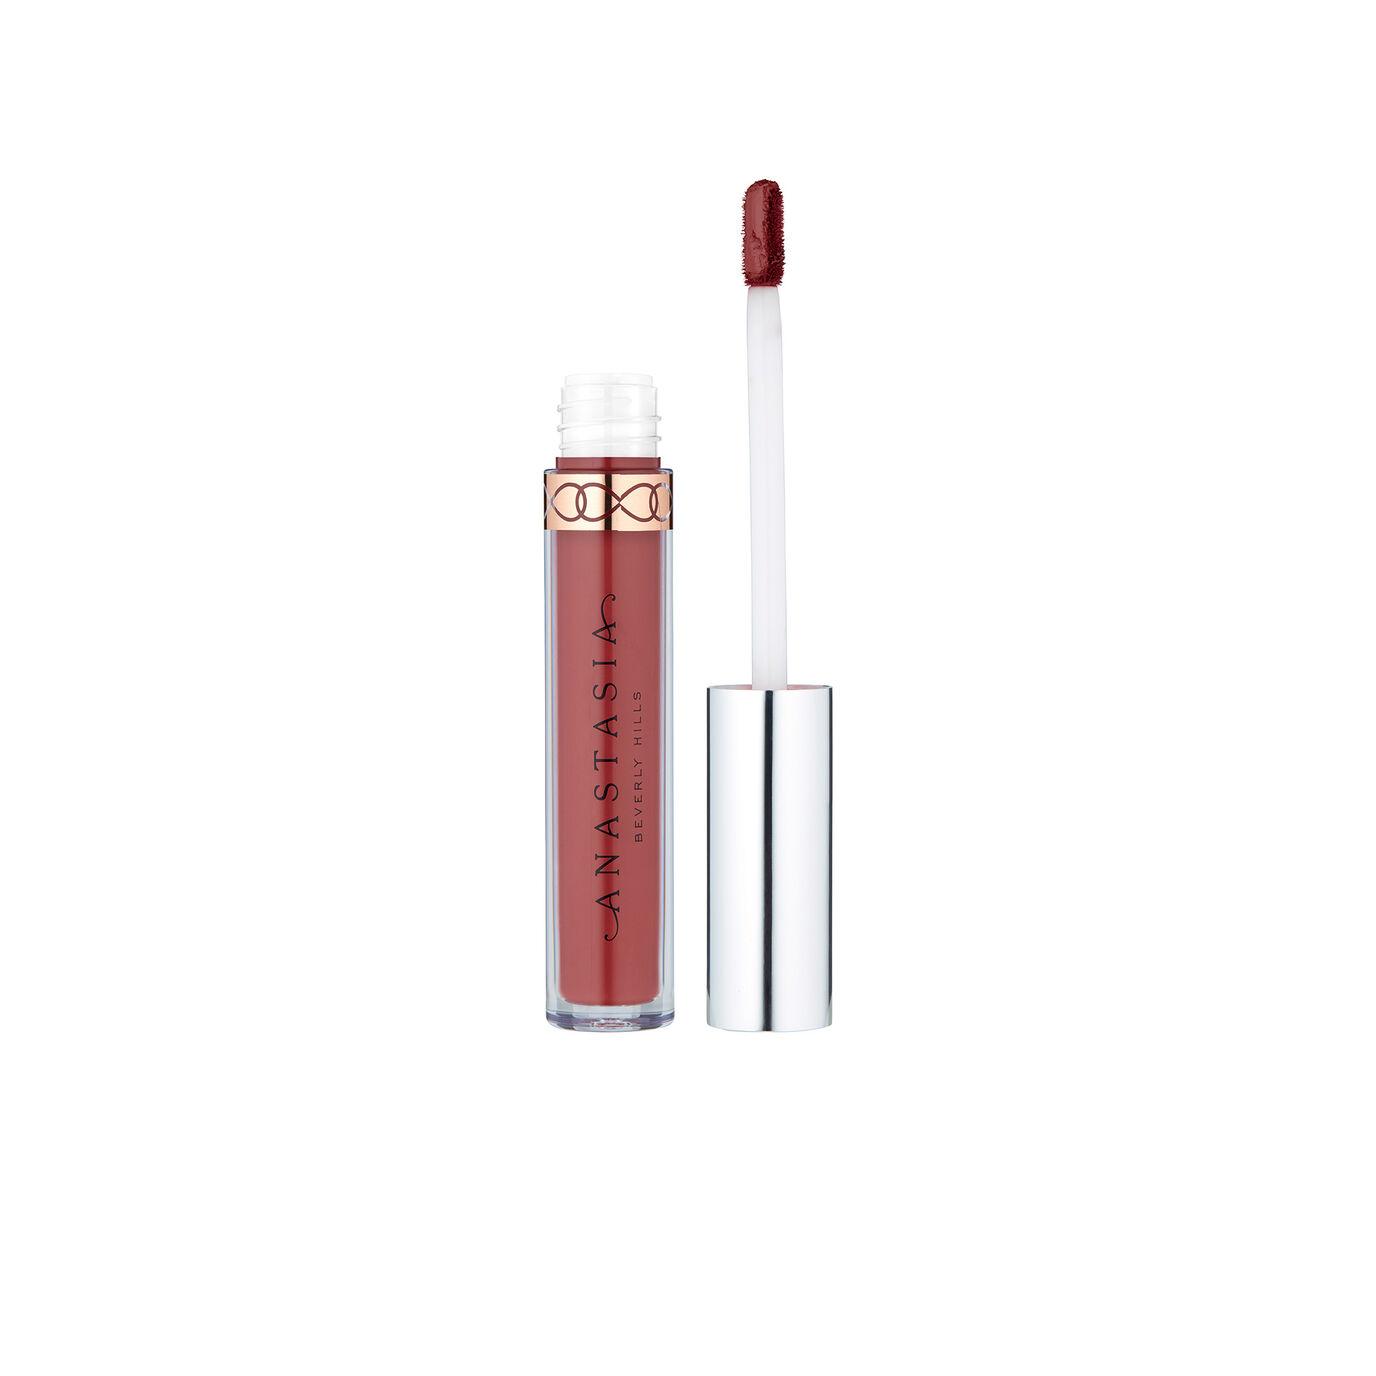 Liquid Lipstick - Dazed